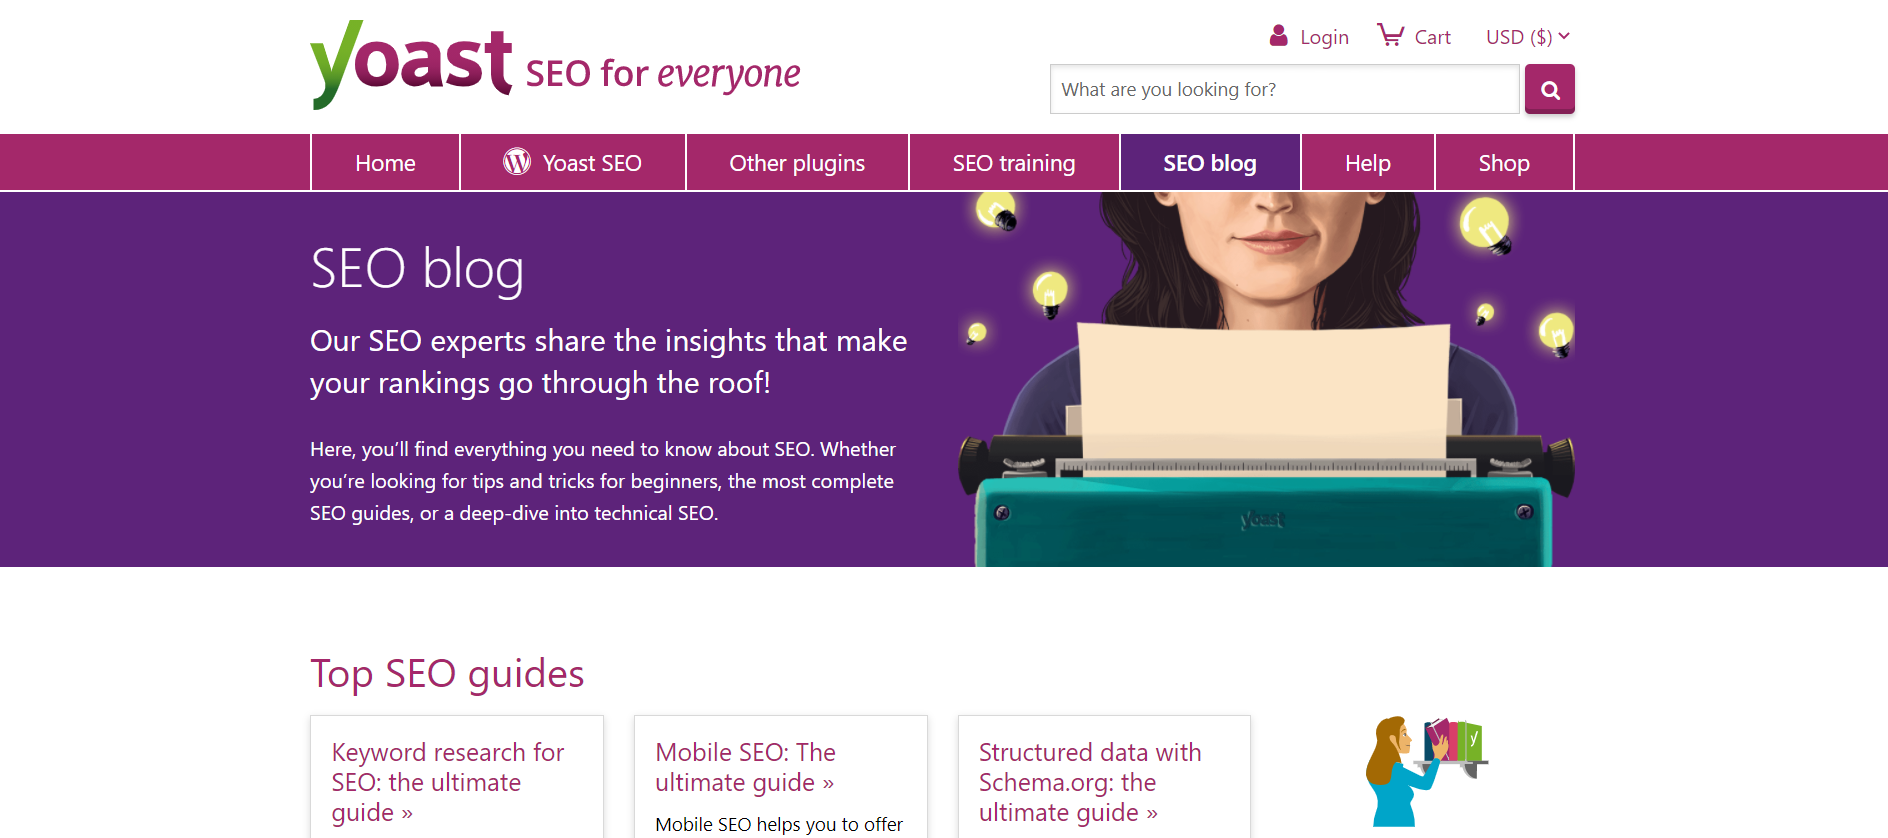 best SEO blog to follow in 2021